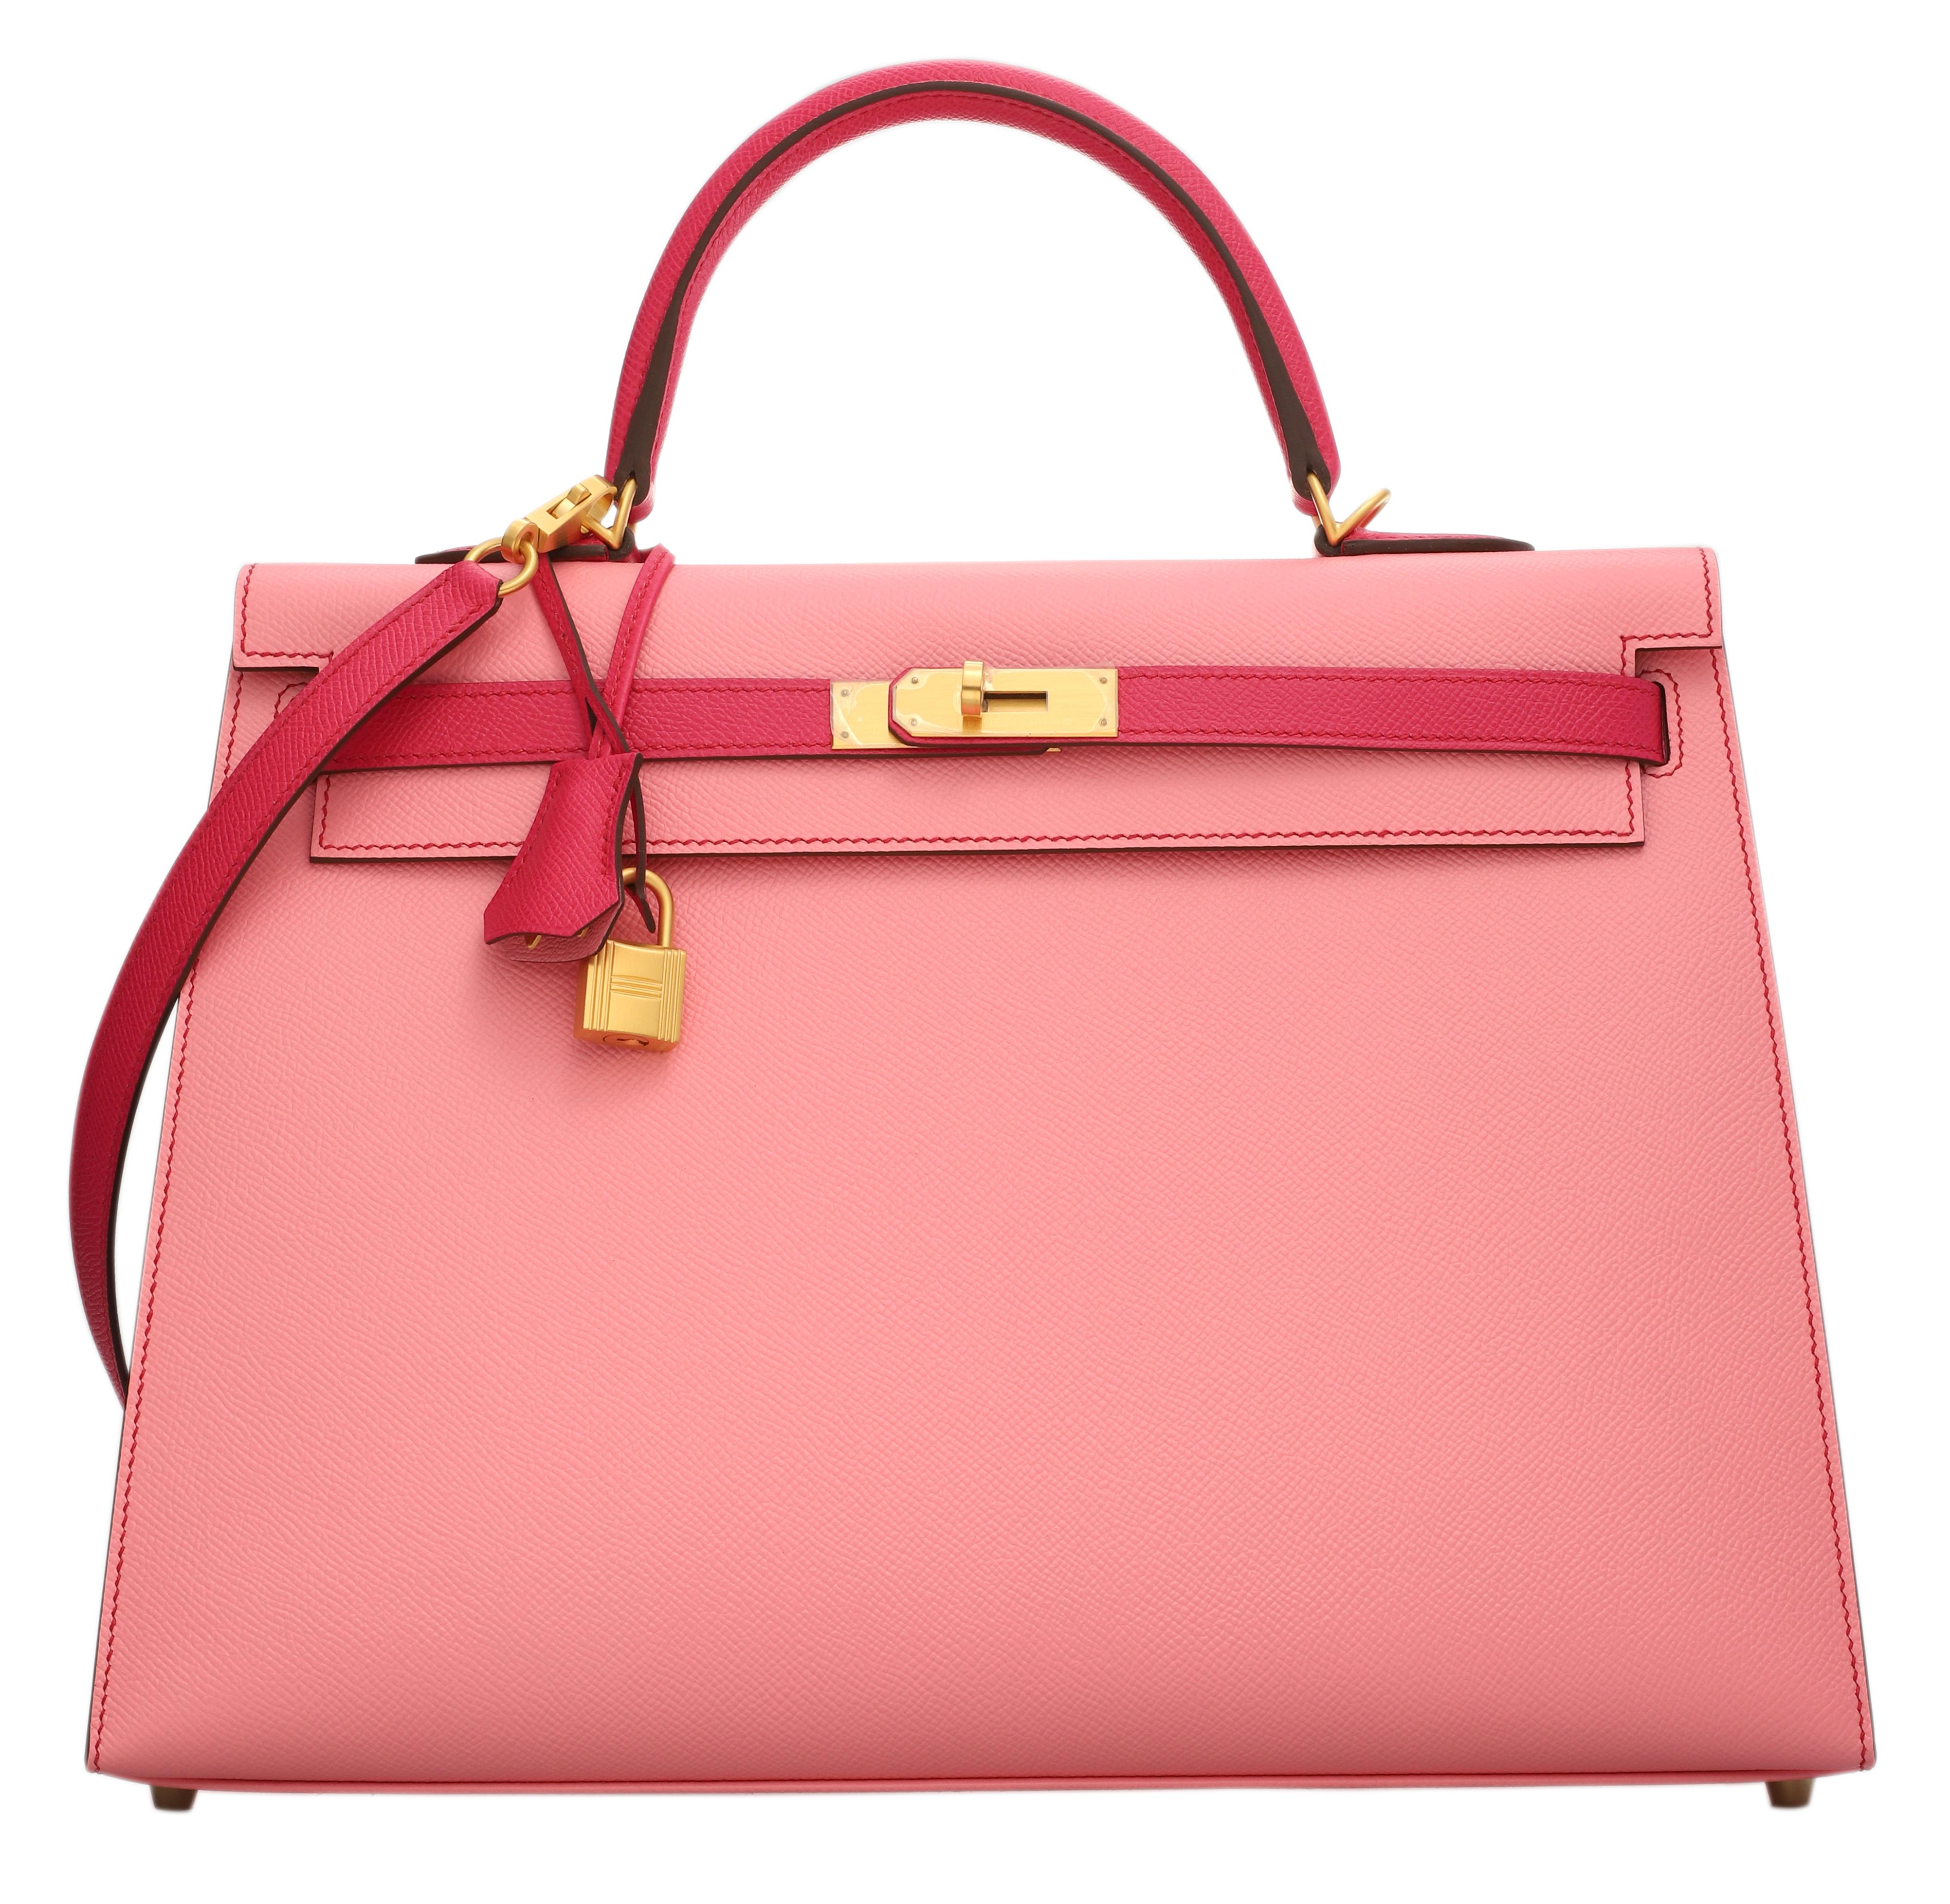 hermes_epsom-kelly-35cm_shiny-tea-pink